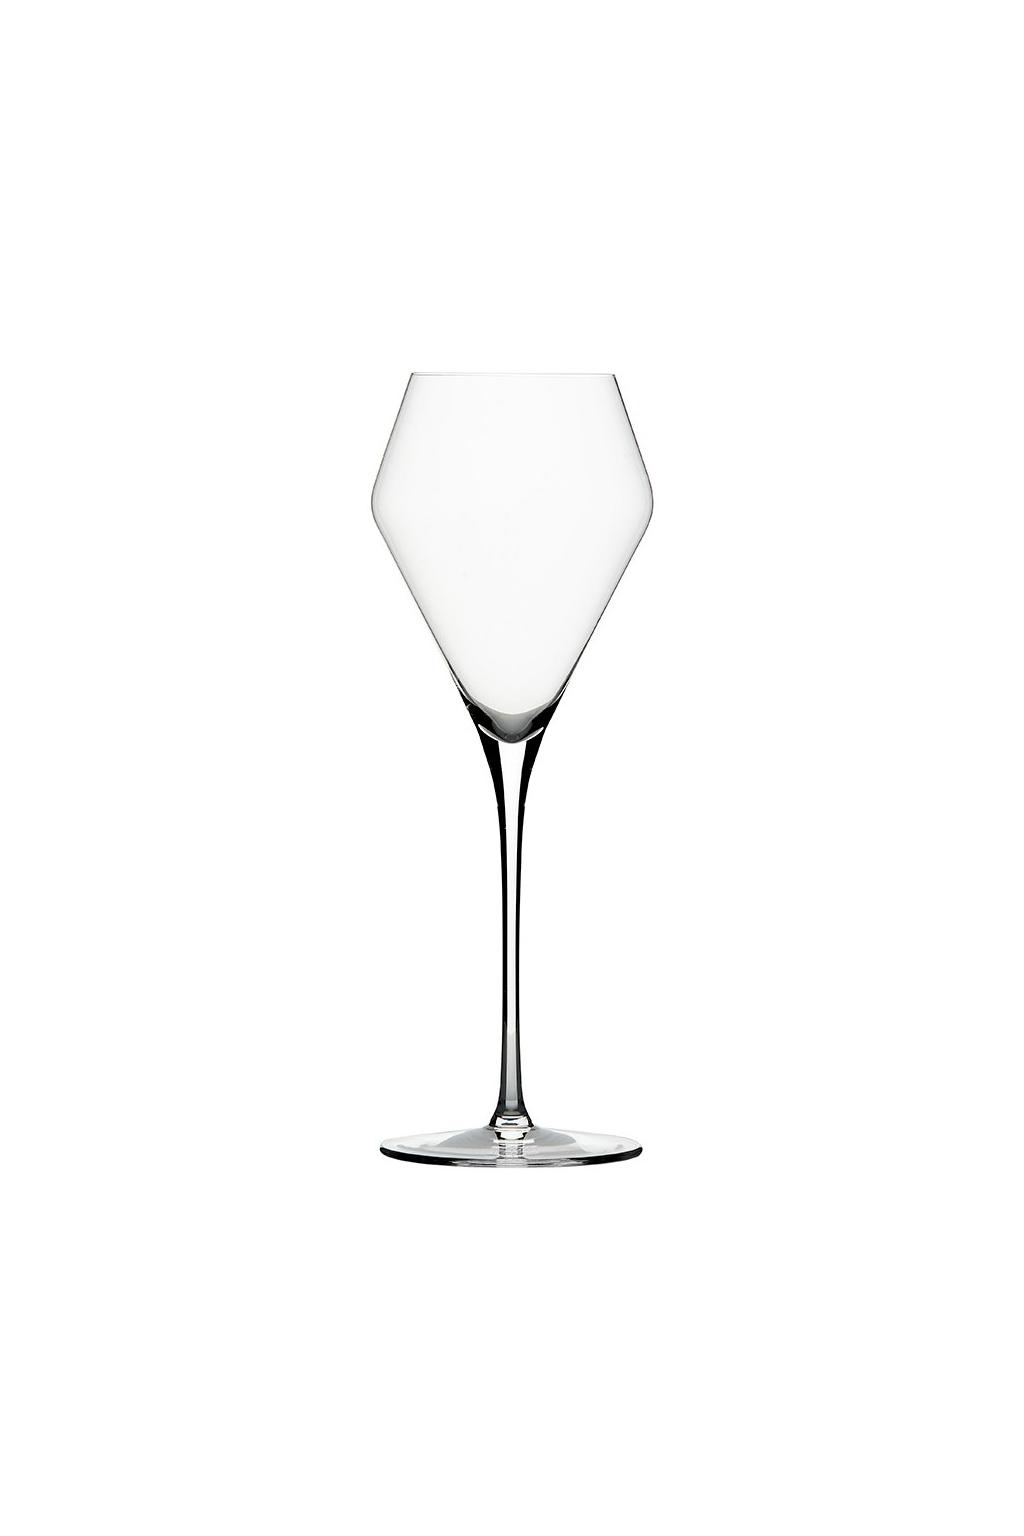 DENK'ART sklo sladké víno